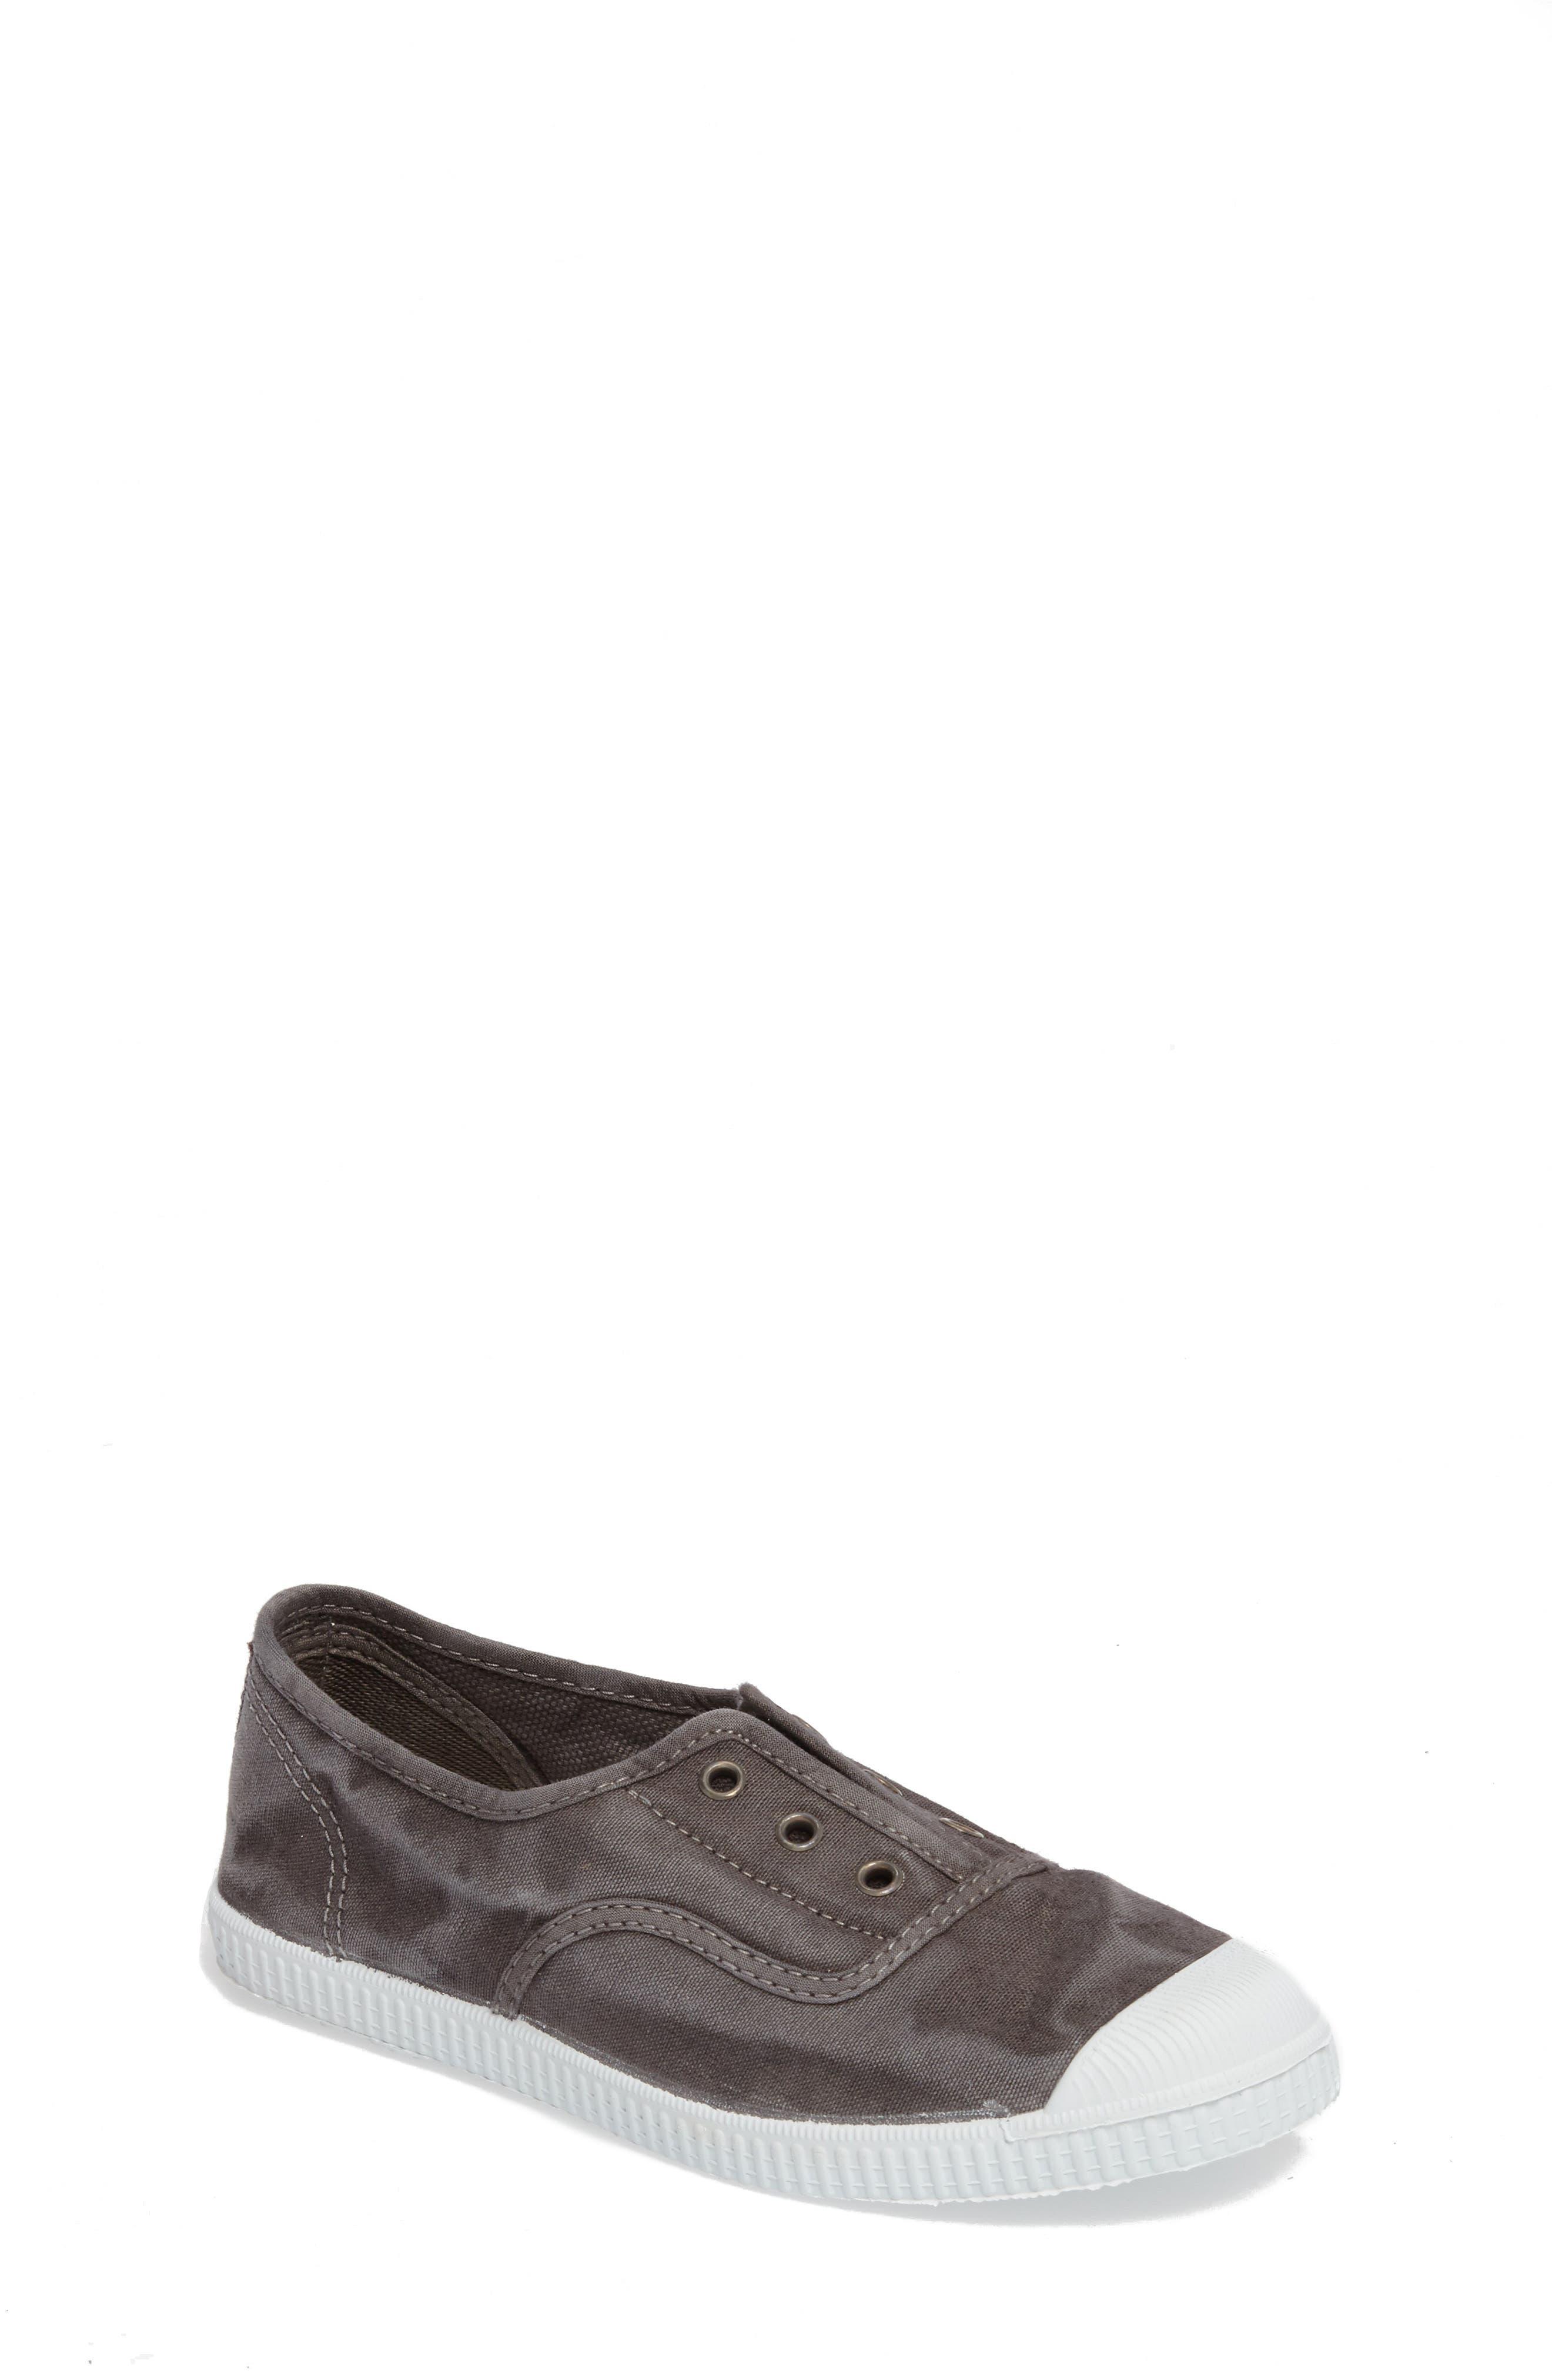 Cienta Laceless Slip-On Sneaker (Walker, Toddler, Little Kid & Big Kid)